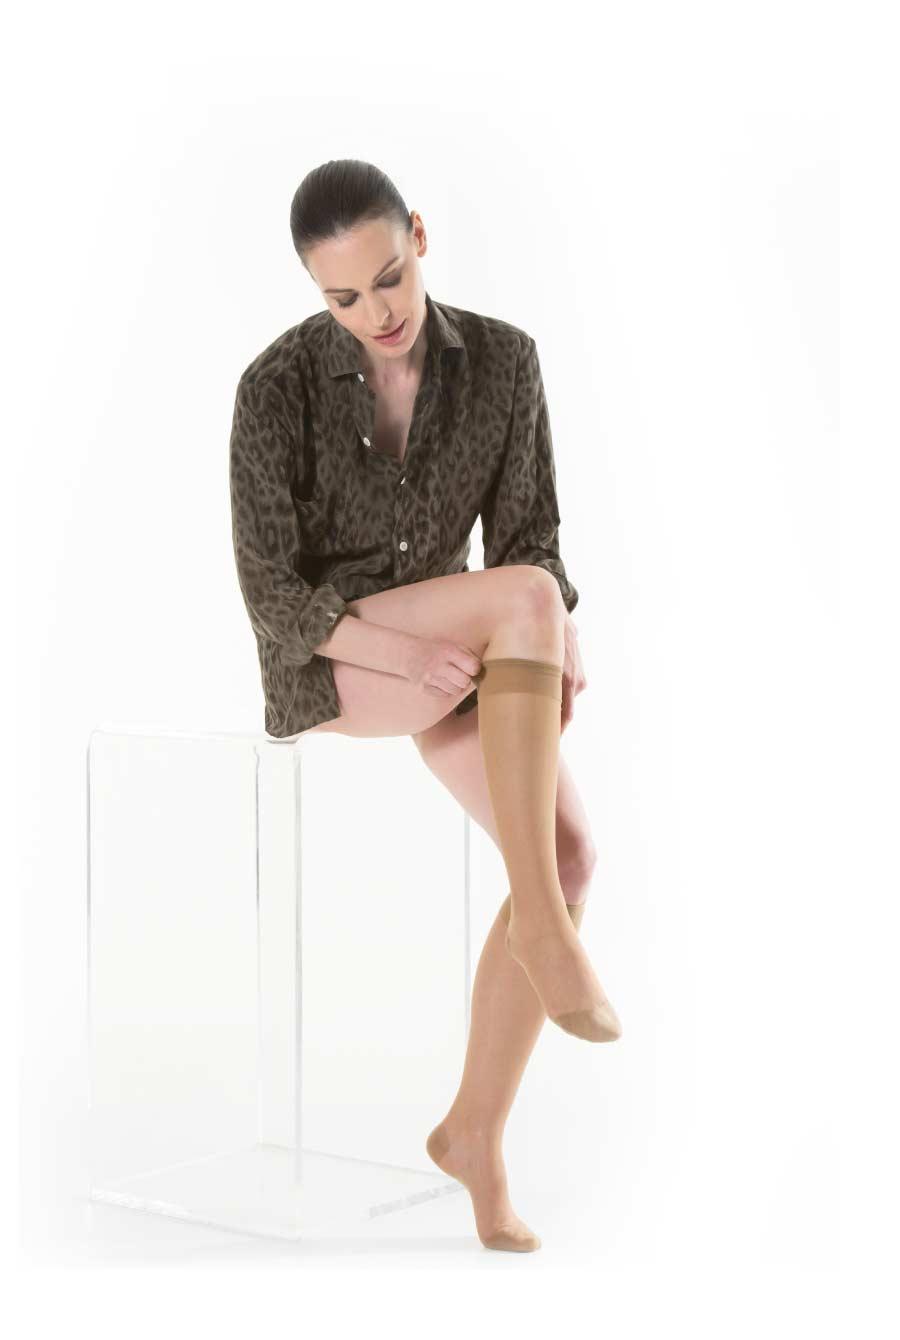 Image of CA-MI Kami Bas New 140 Gambaletto 3 Visone 923502621